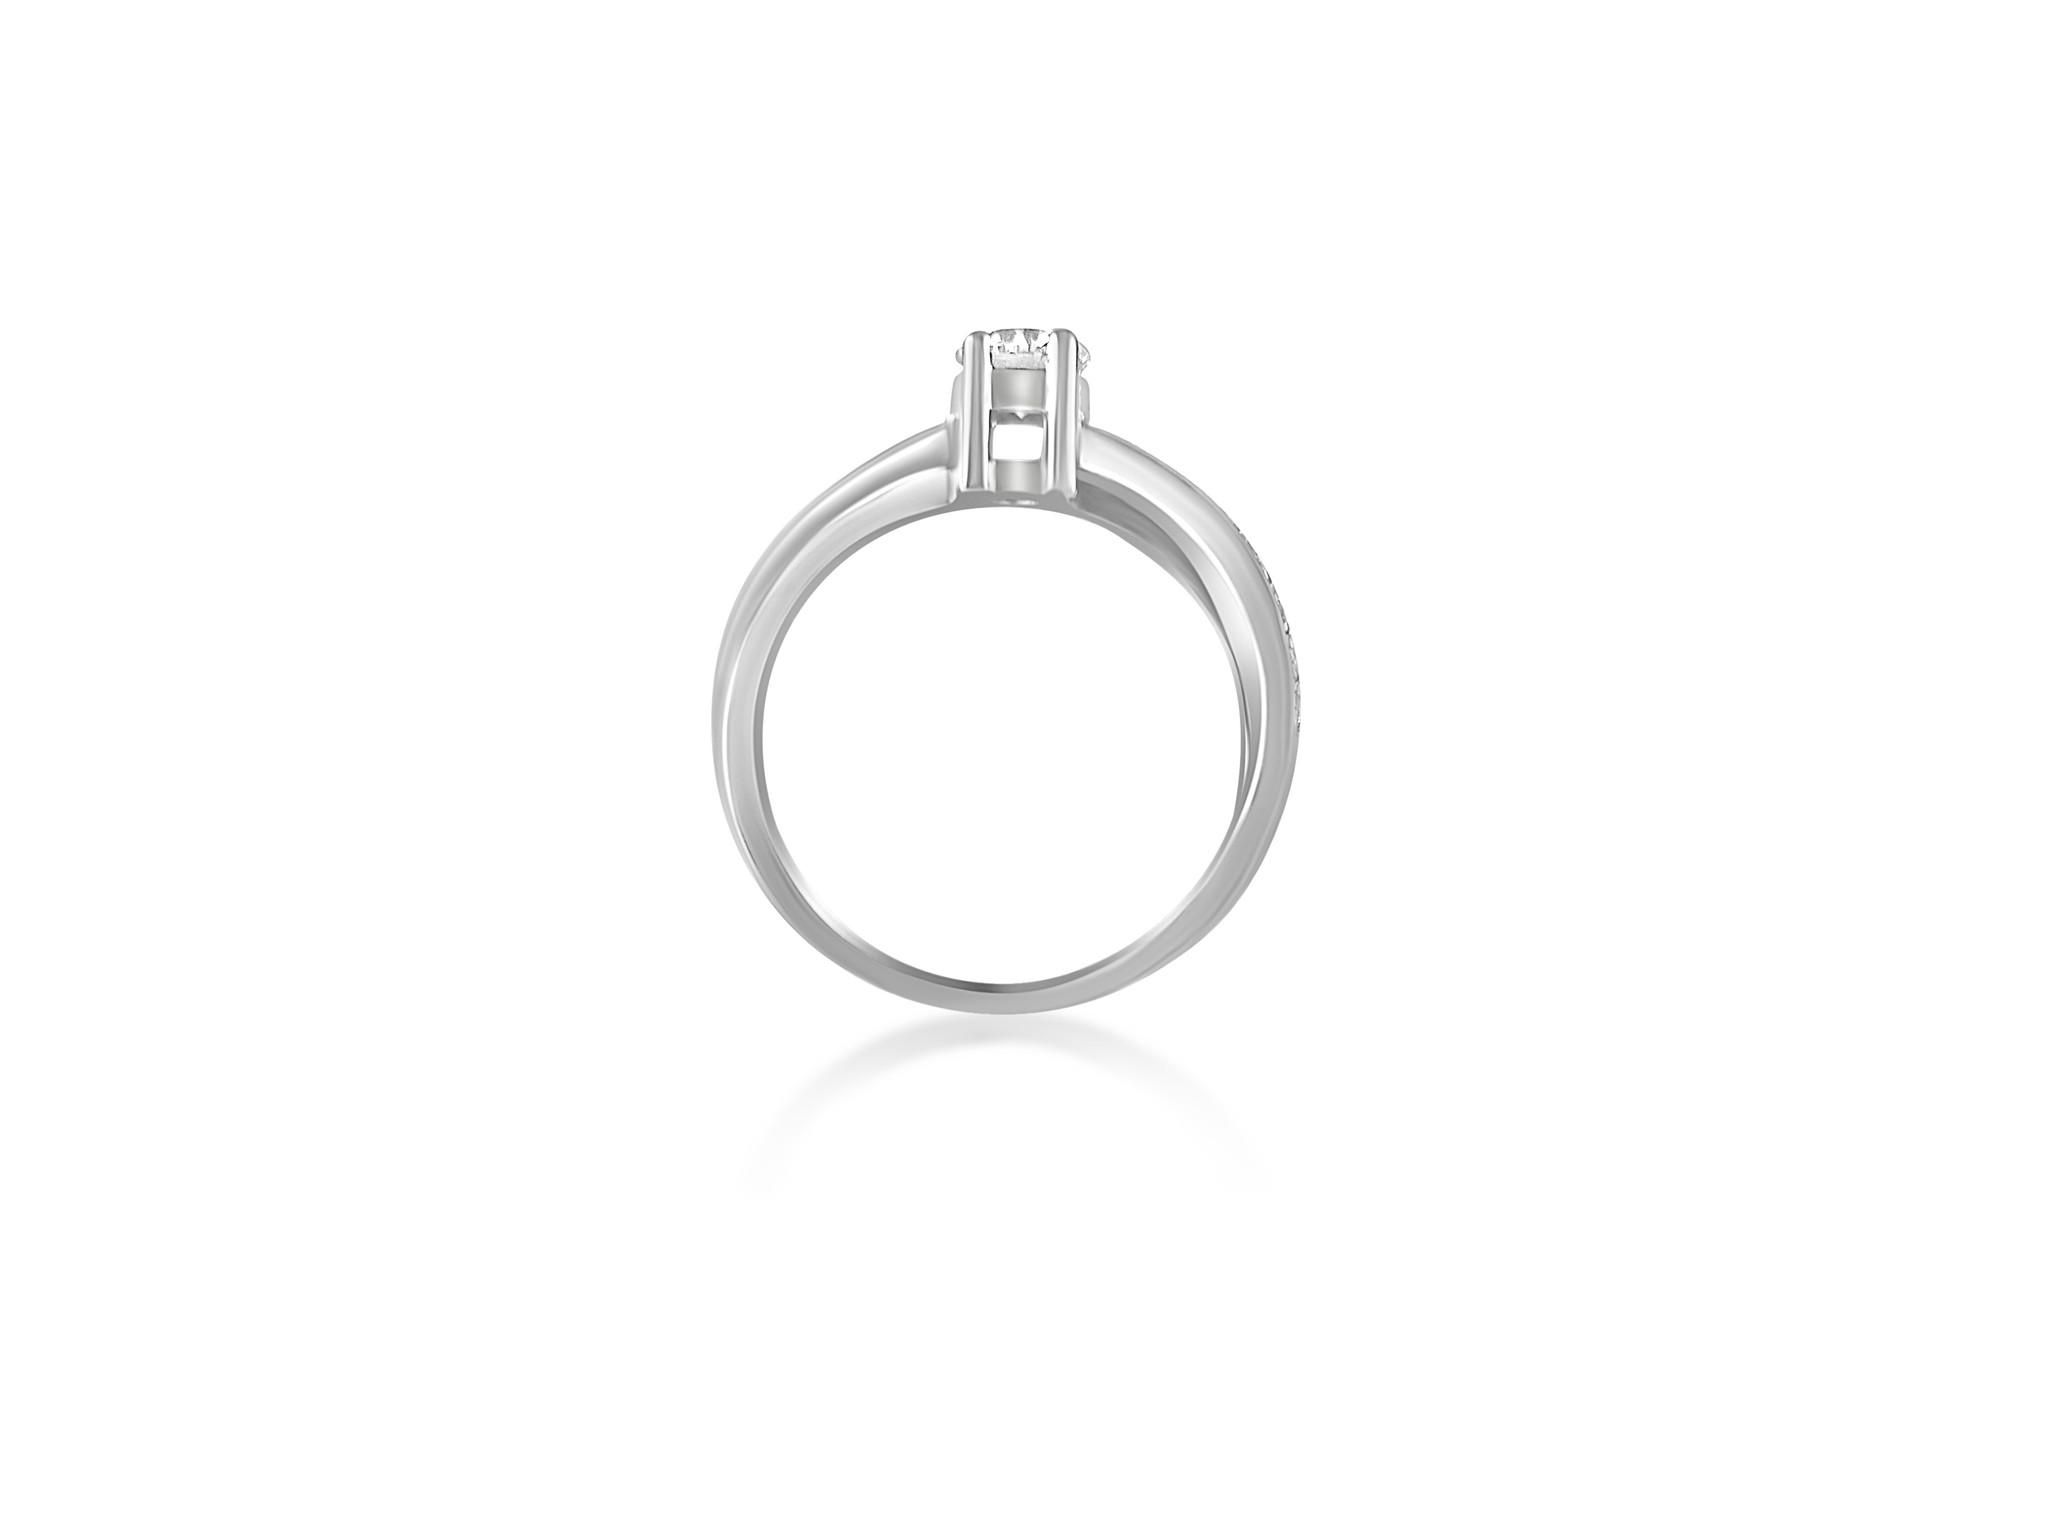 18k wit goud verlovingsring met 0.71 ct diamanten